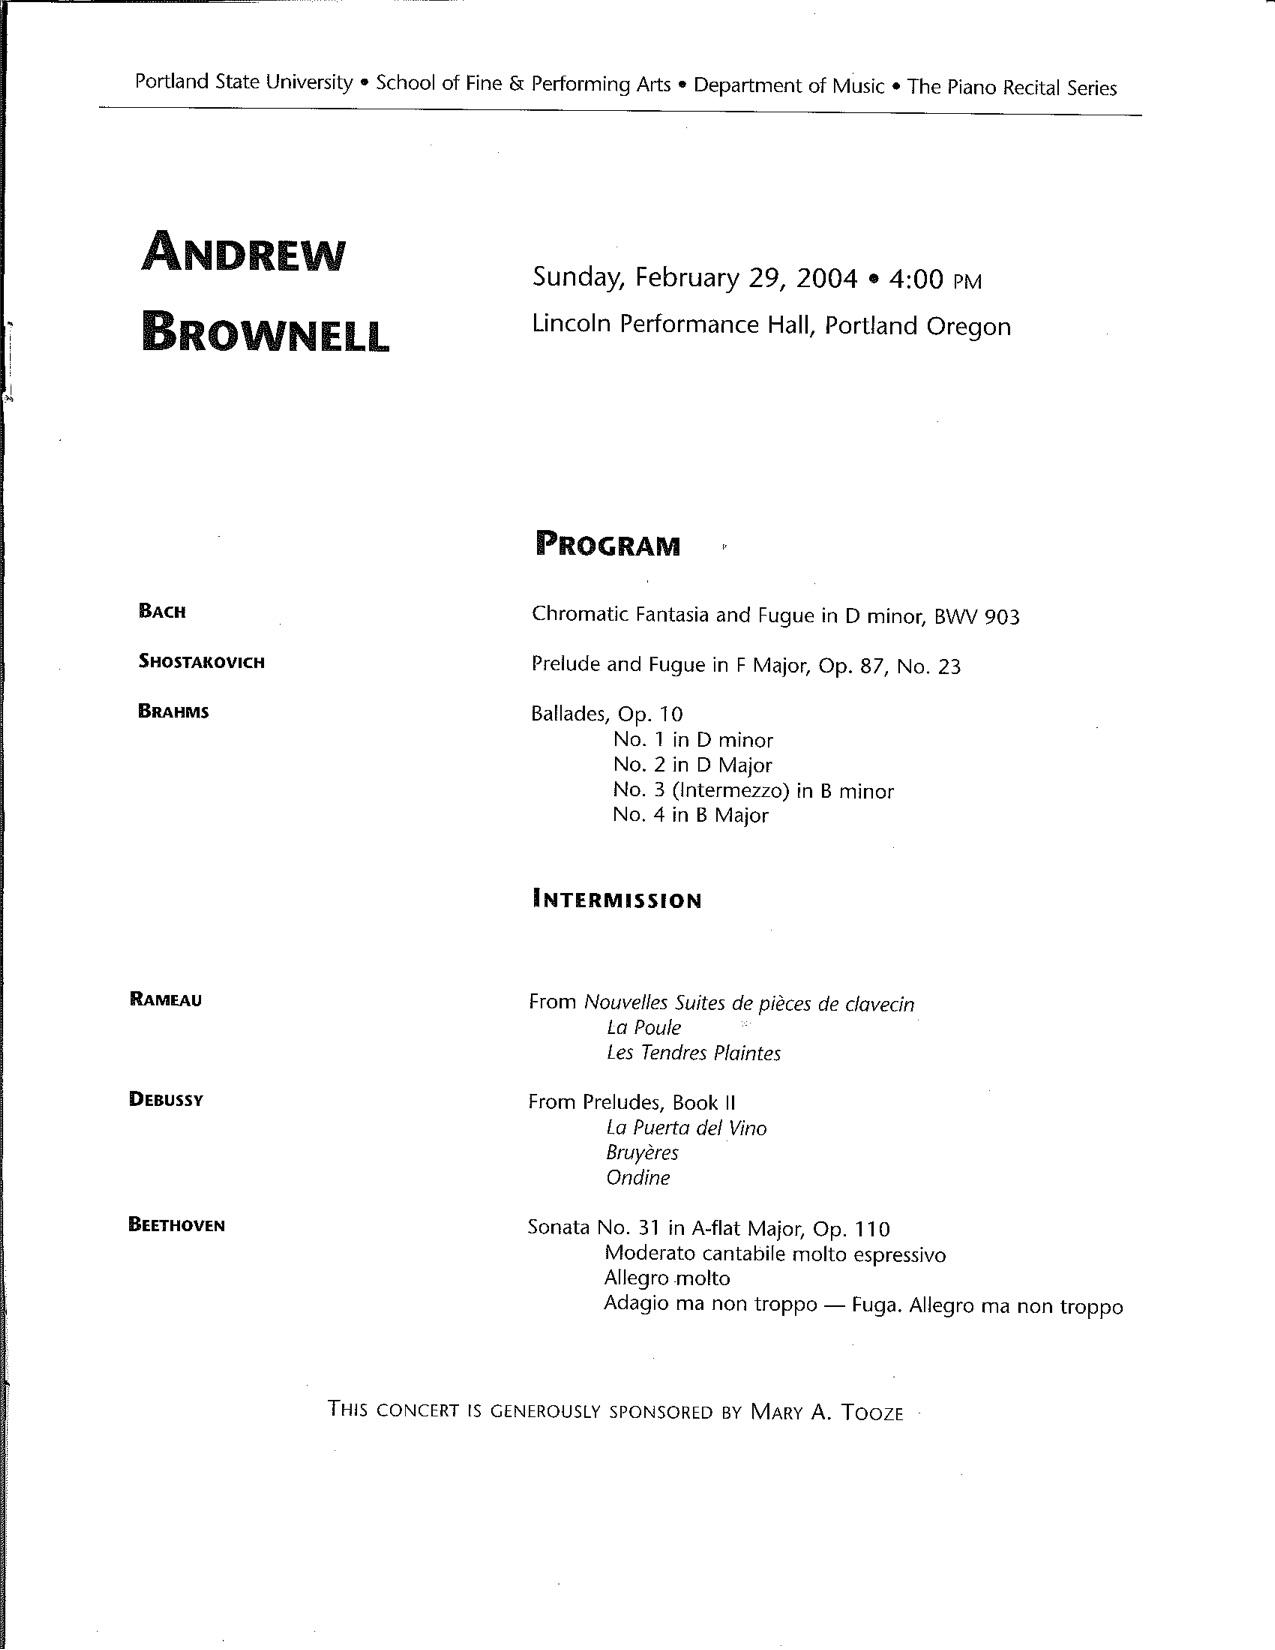 Brownell03-04_Program2.jpg